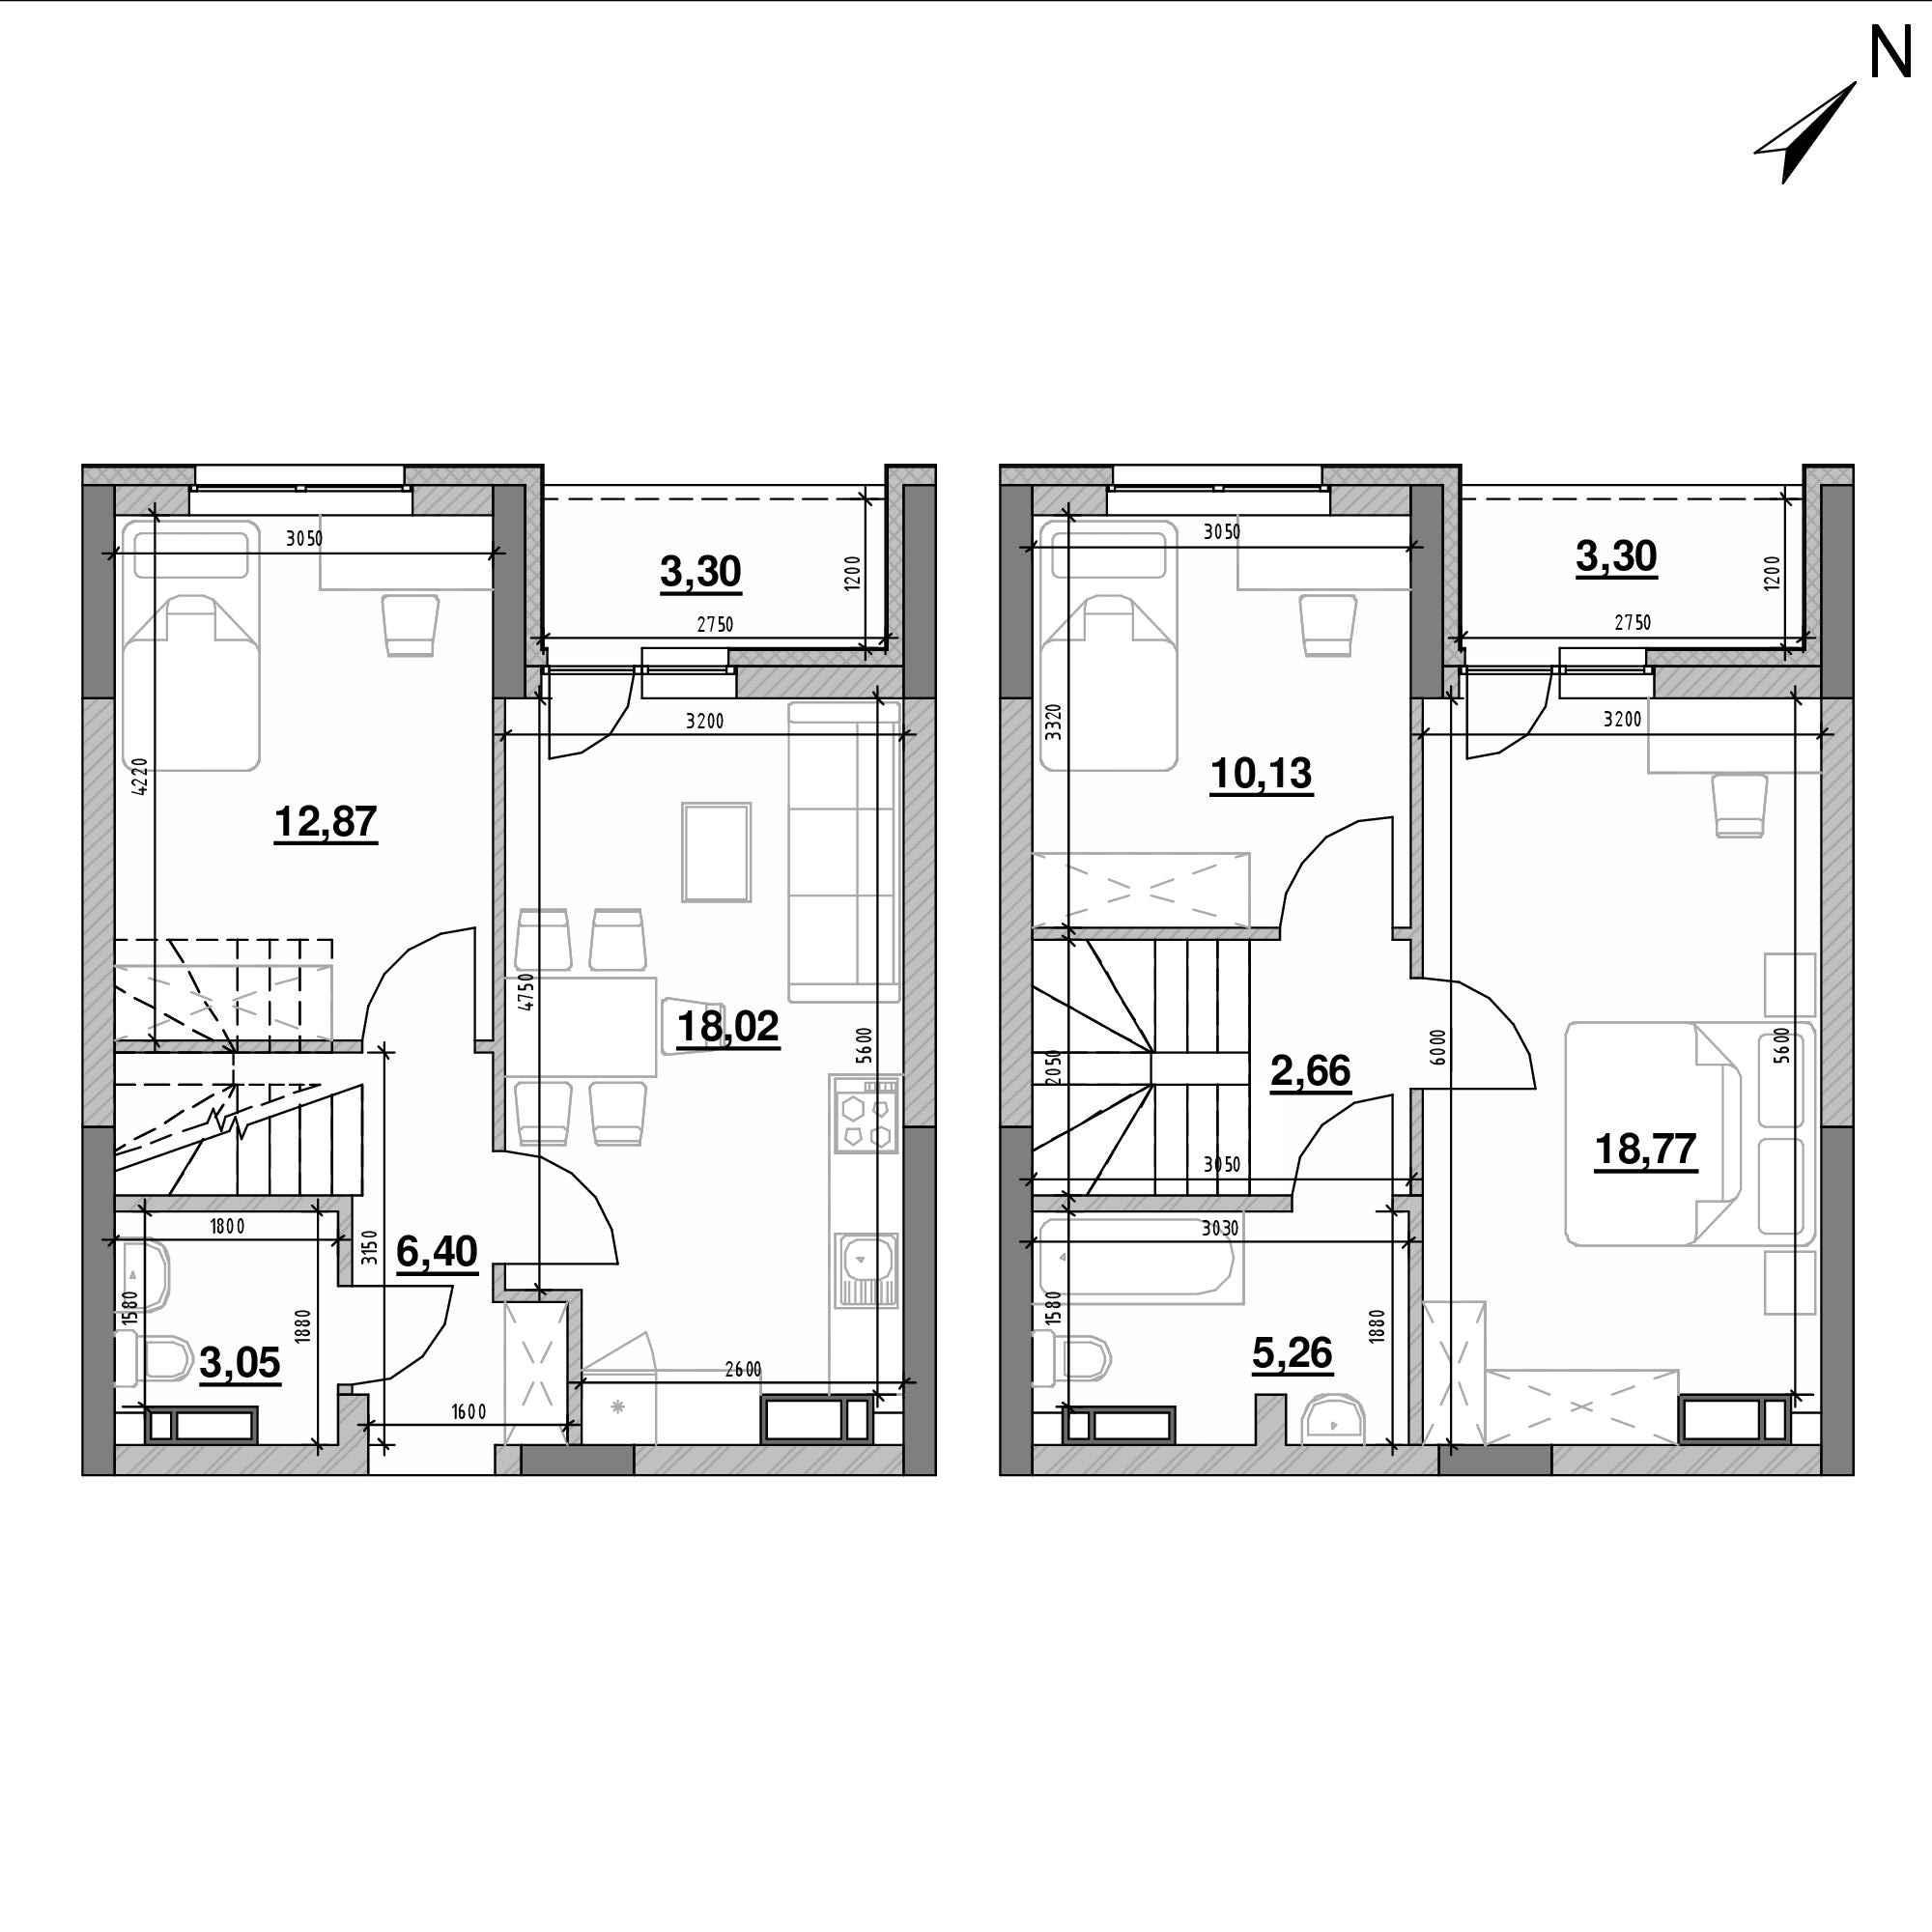 ЖК Оk'Land: планування 3-кімнатної квартири, №633, 83.76 м<sup>2</sup>